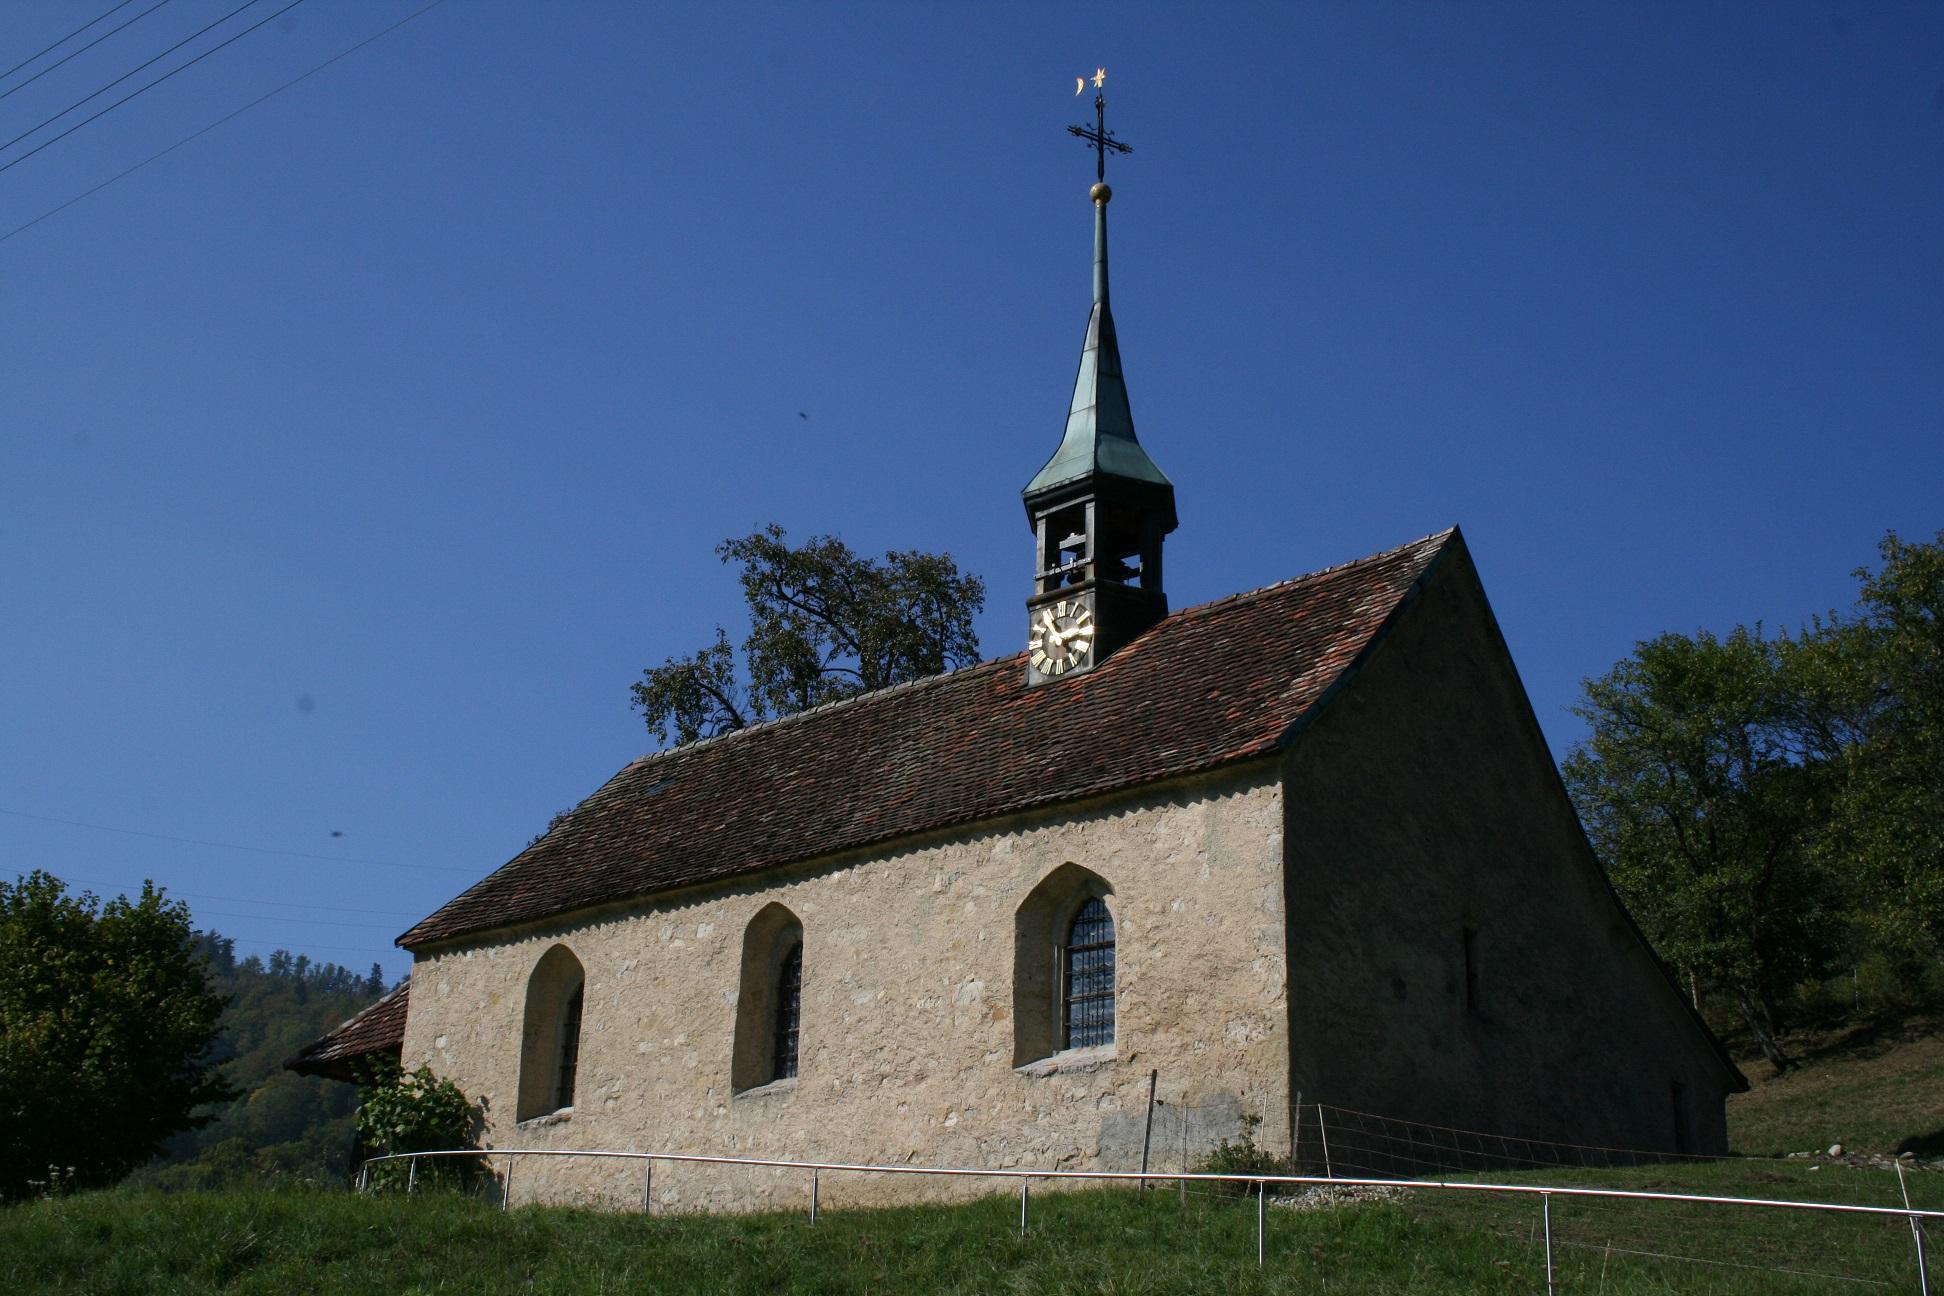 St. Ulrich-Kapelle